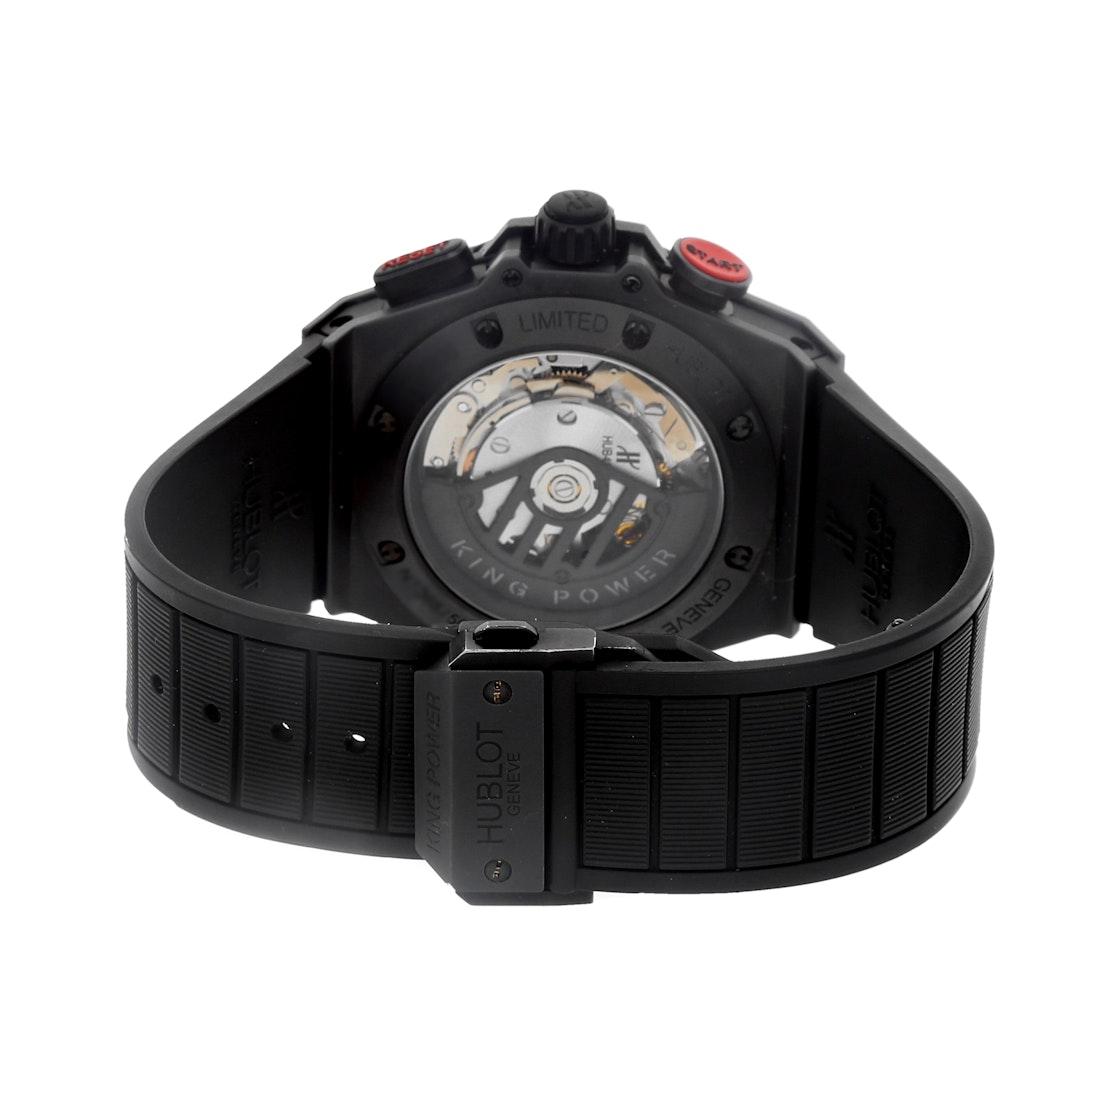 Hublot King Power F1 Ceramic Limited Edition 703.CI.1123.NR.FM010